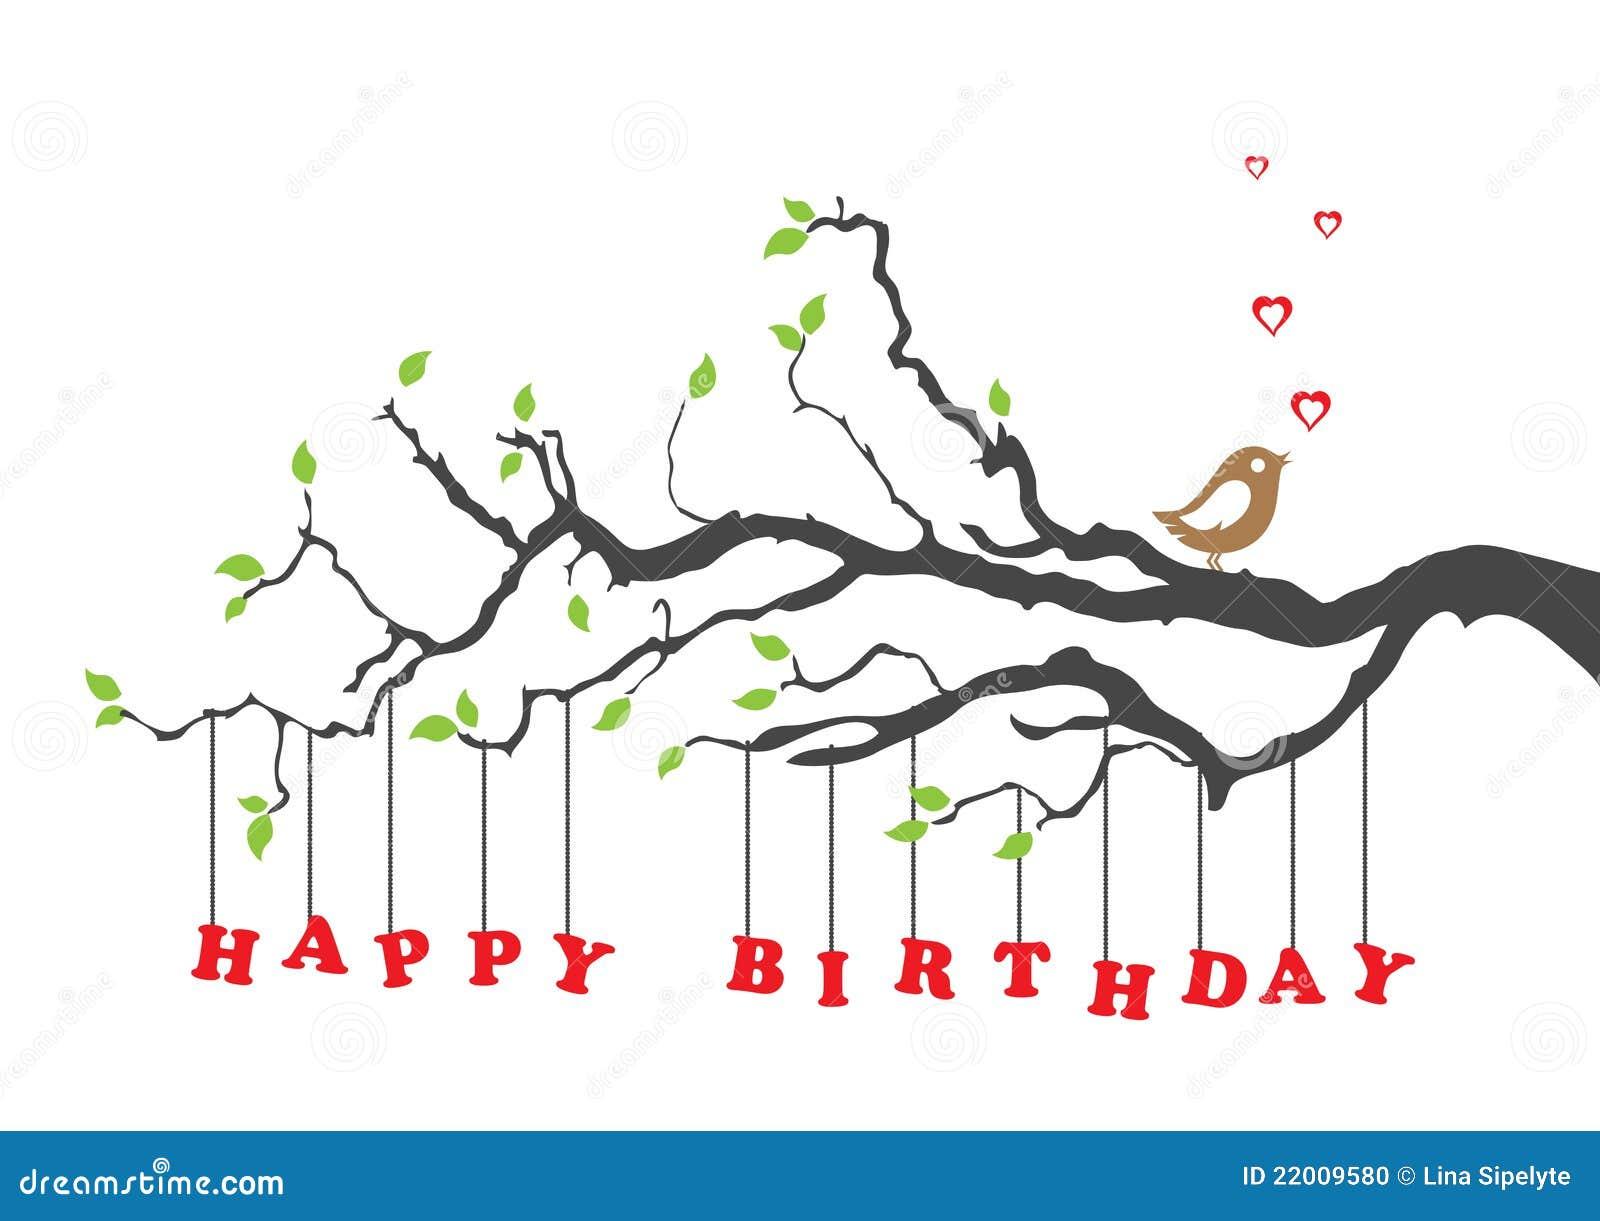 Feliz cumpleaños, marietita !!! Tarjeta-del-feliz-cumplea%C3%B1os-con-el-p%C3%A1jaro-22009580